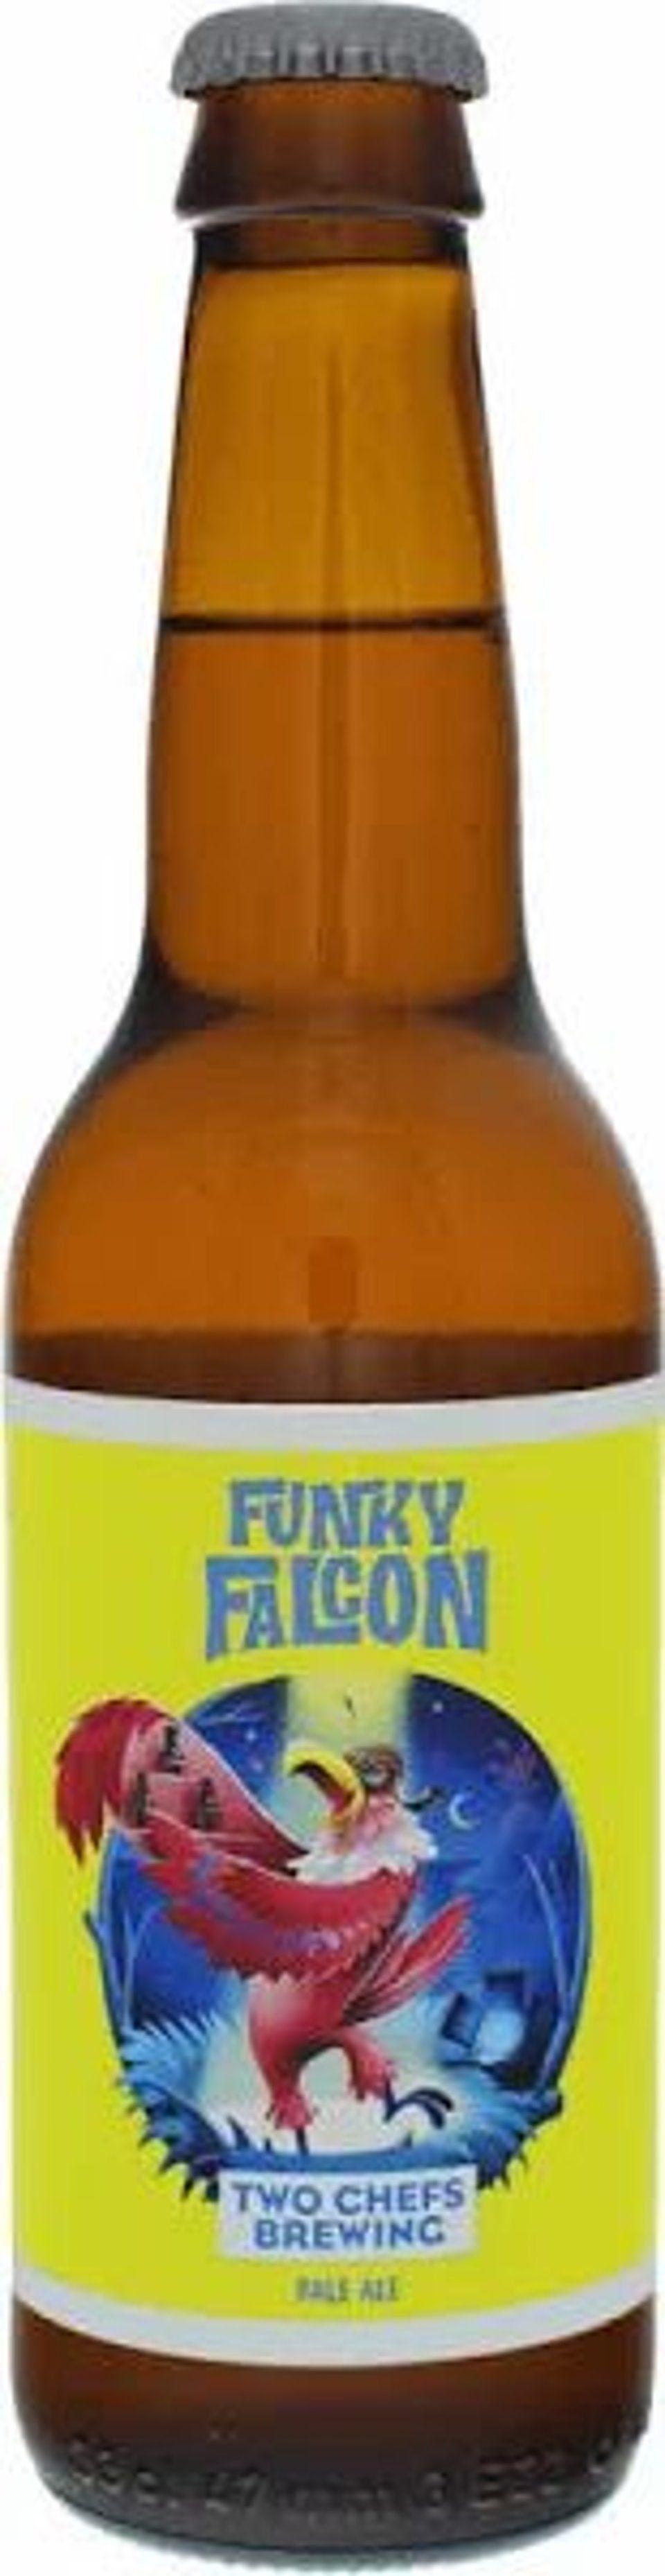 Funky falcon 5,2%